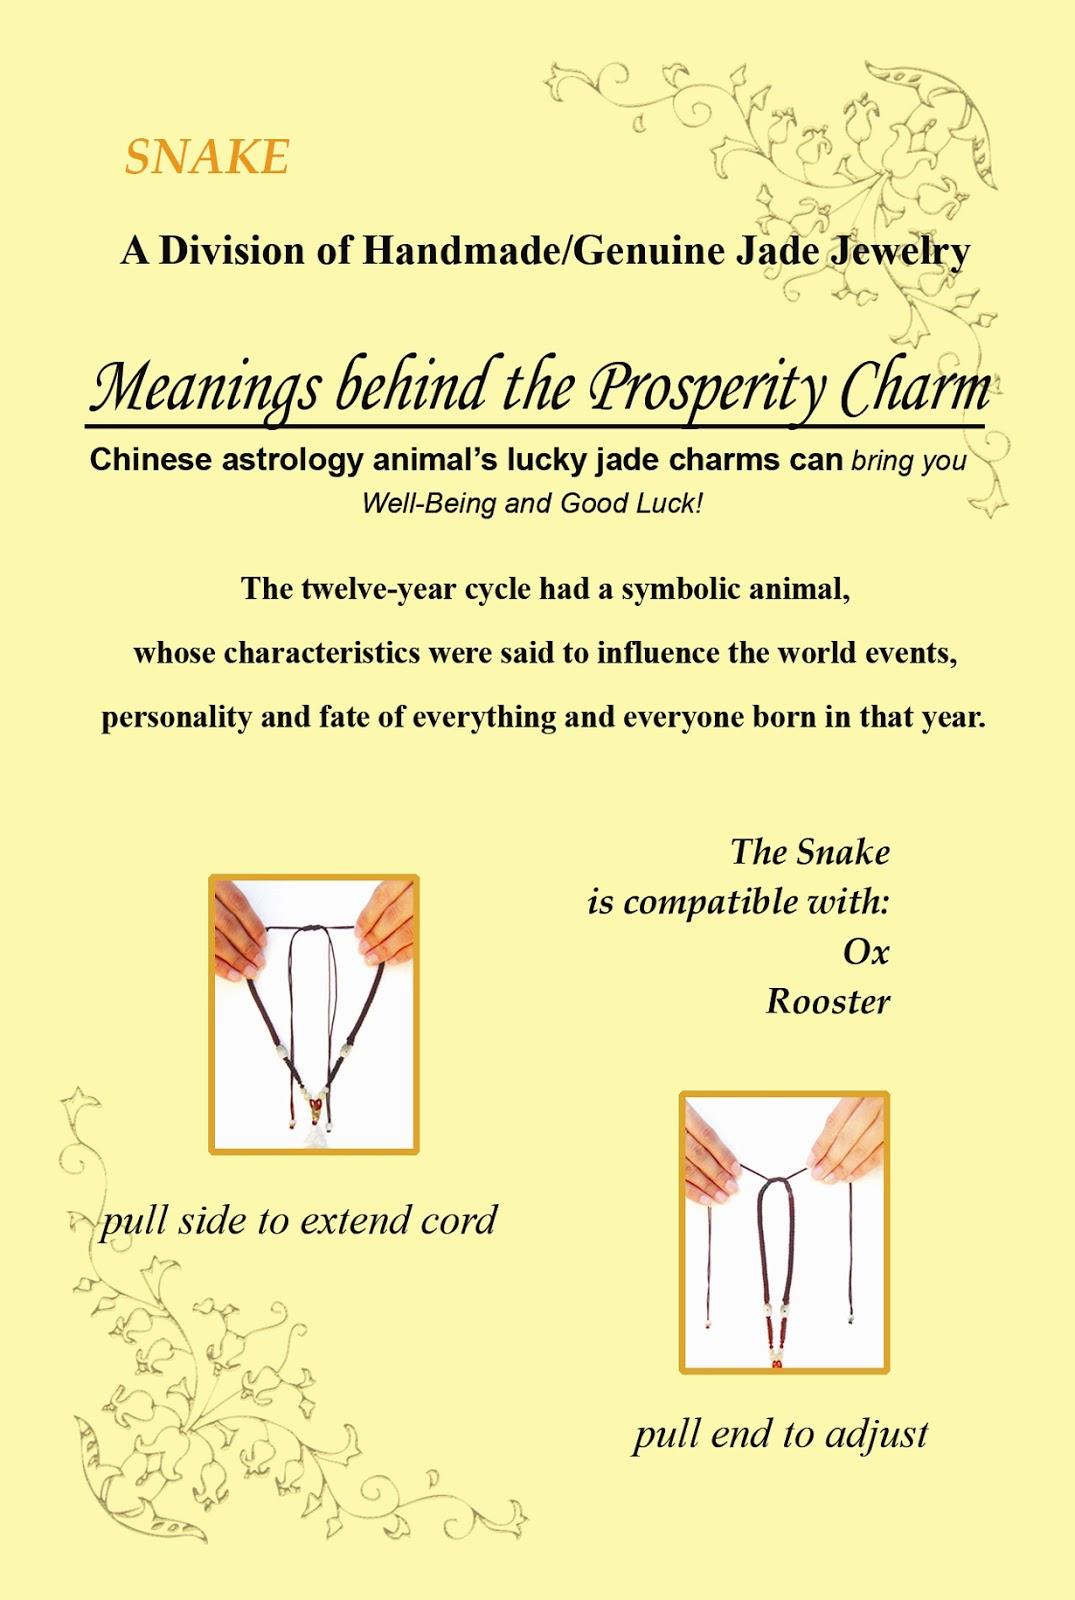 Songs Gems Genuine Jade Jewelry: All Jewelry Are Hand-made